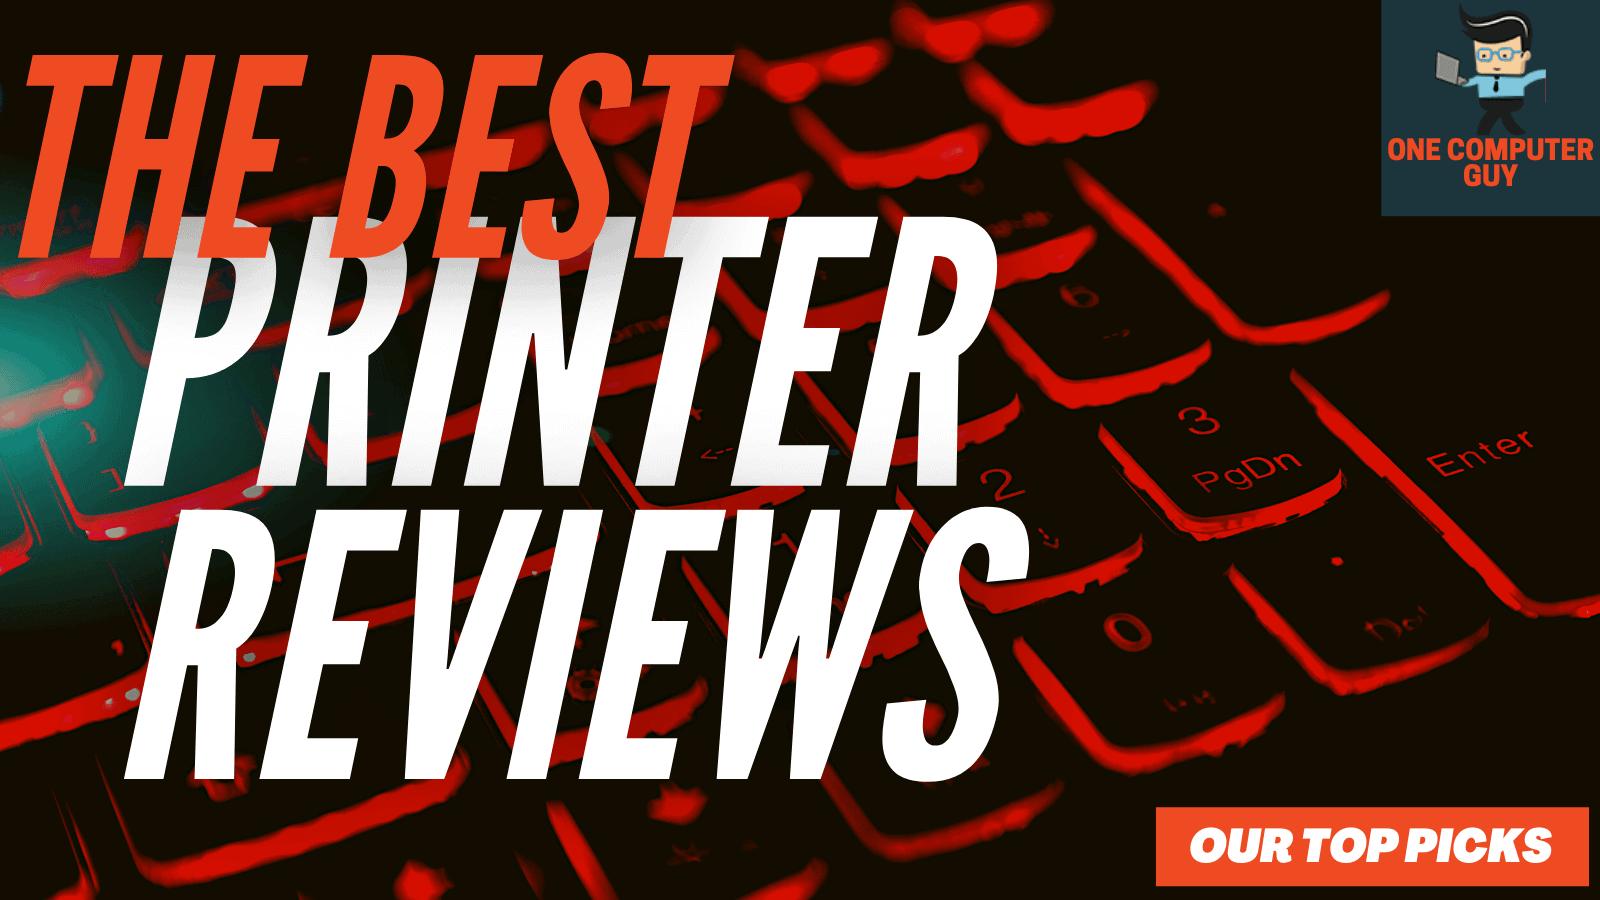 Printer reviews